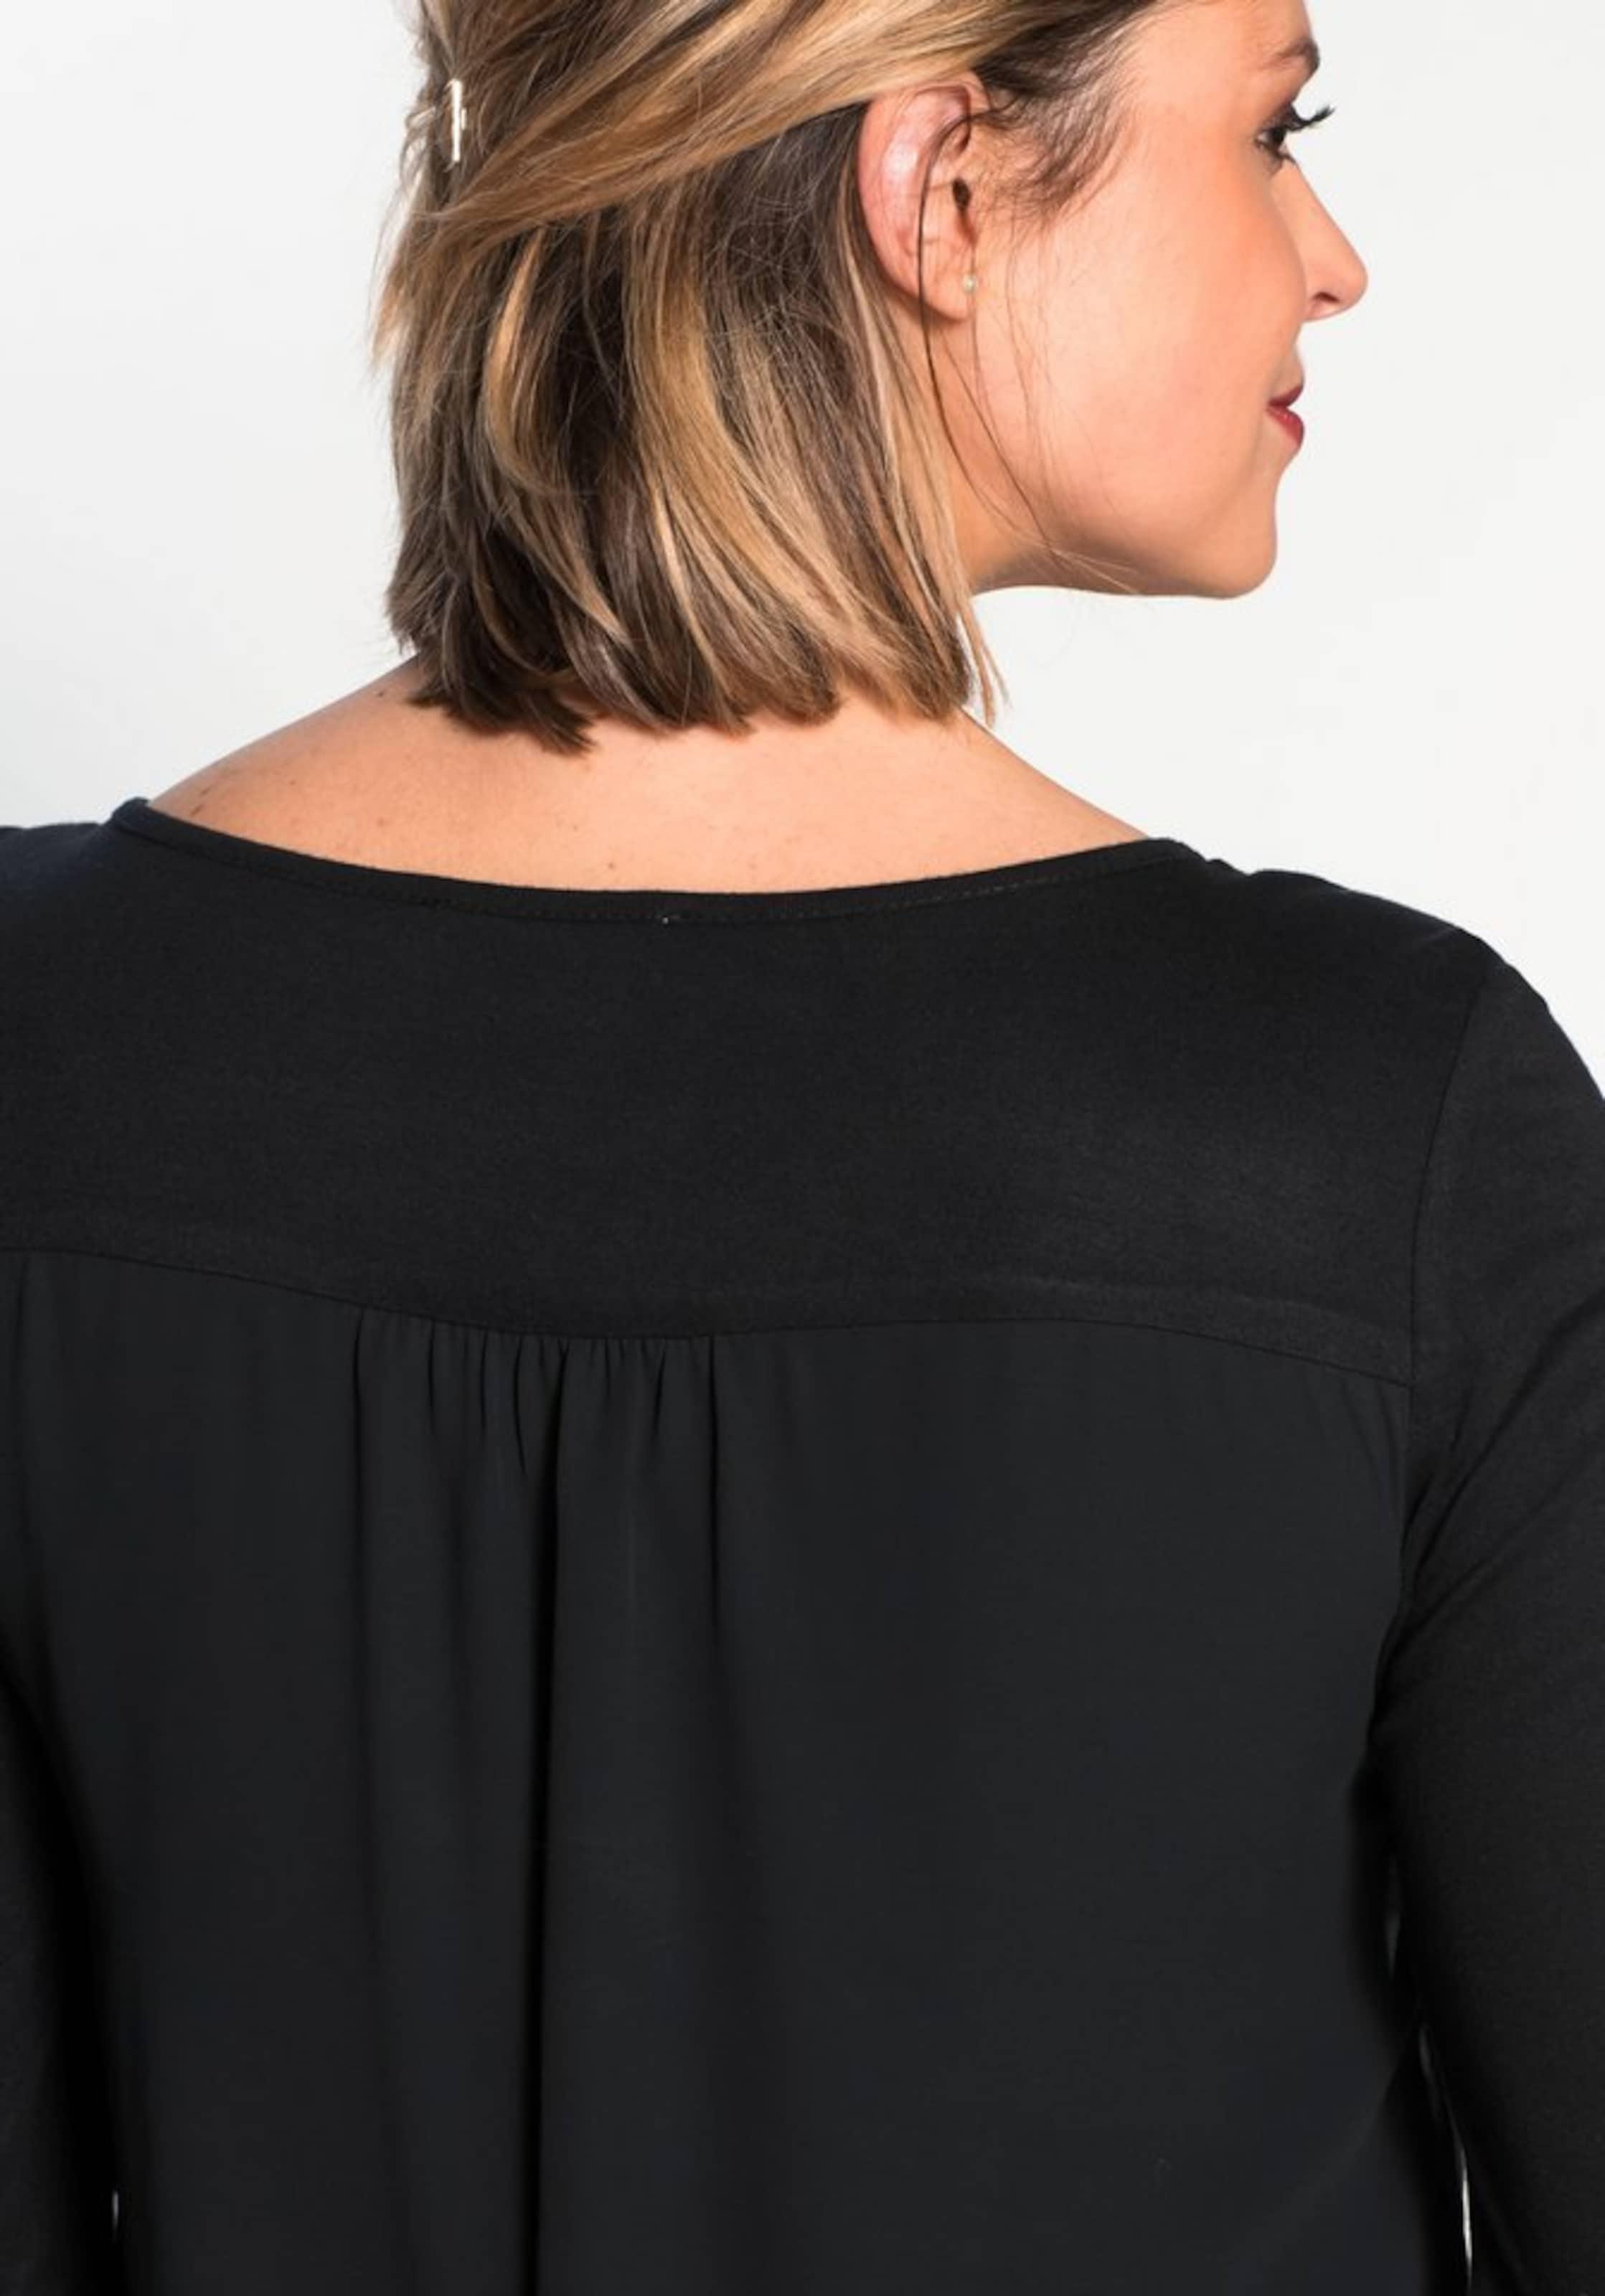 sheego style Tunika Niedrige Versandgebühr Günstiger Preis NZssp9u